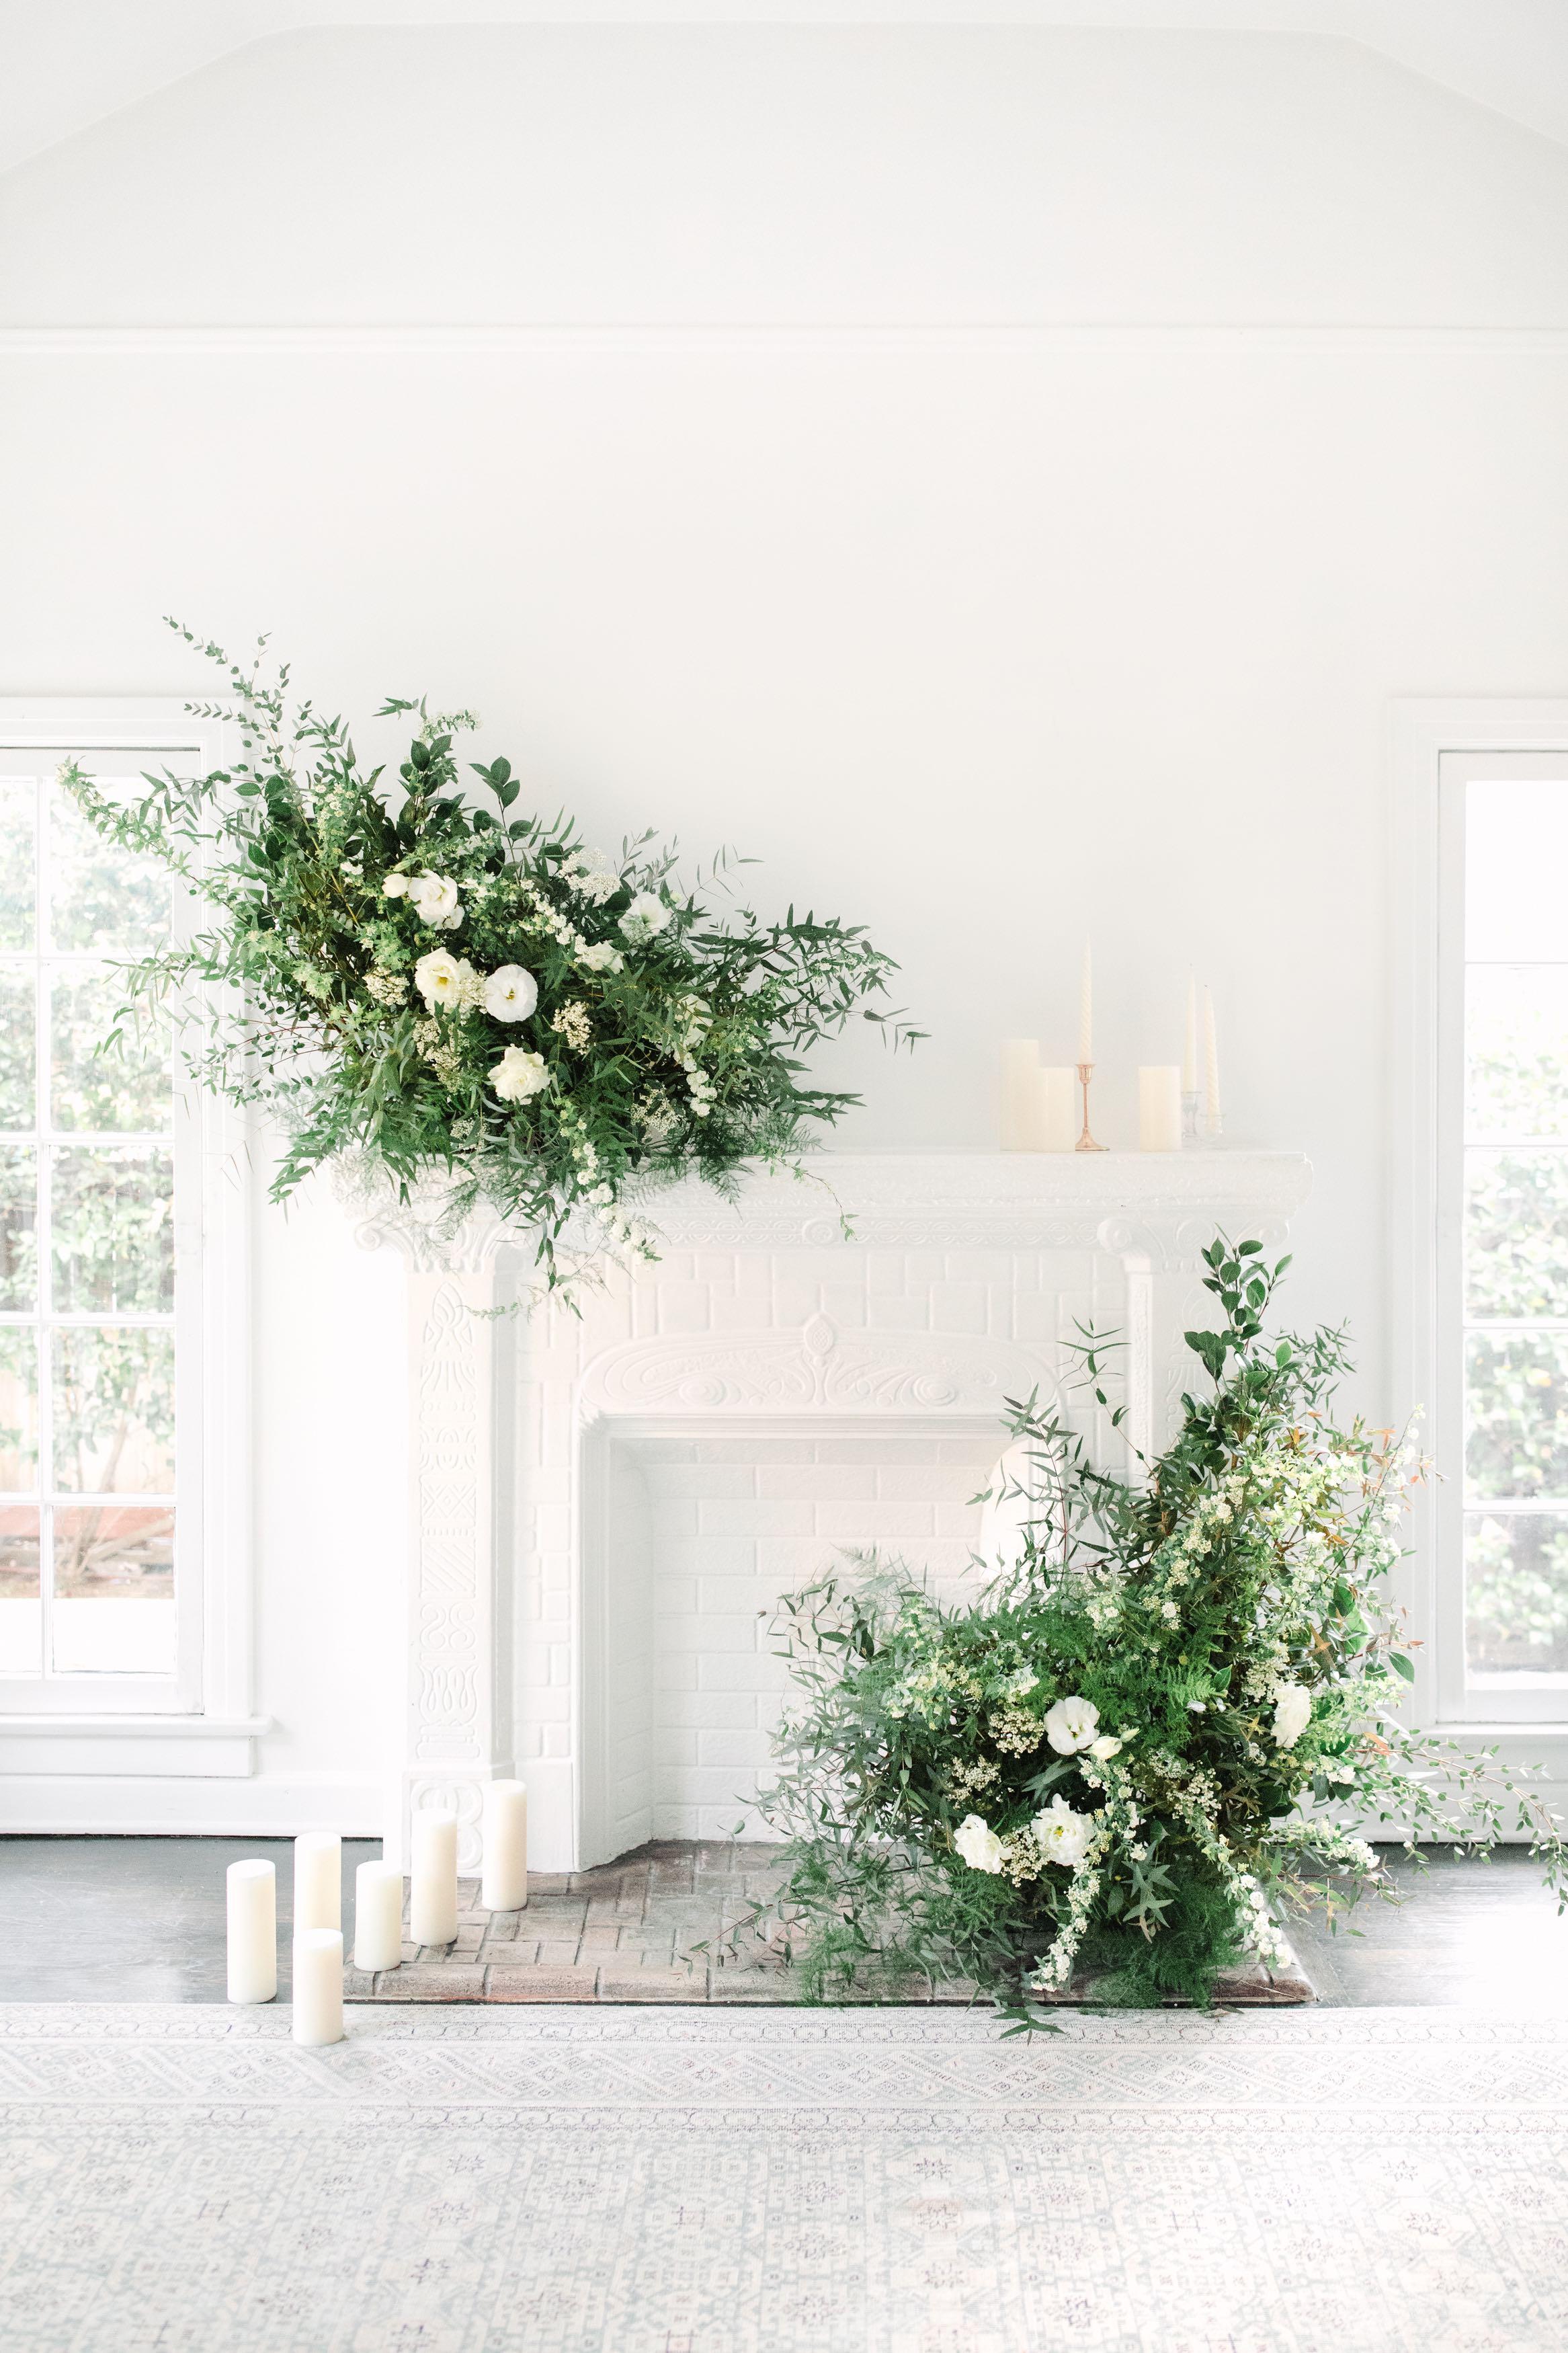 Flower arrangements on mantel